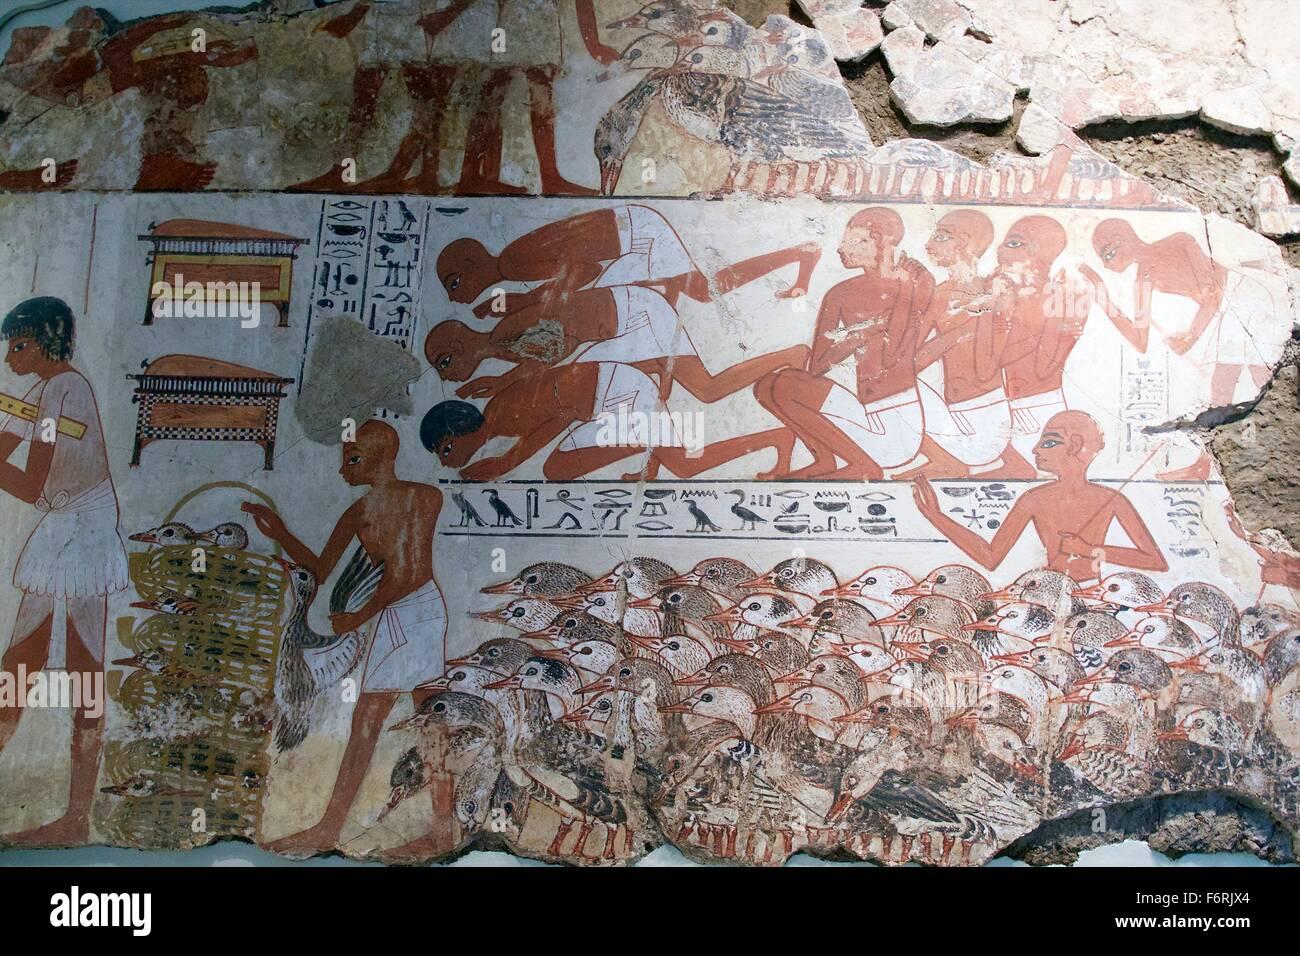 Visualización Nebamun gansos y ganado, tumba-capilla decoración, British Museum, Londres, Reino Unido. Imagen De Stock